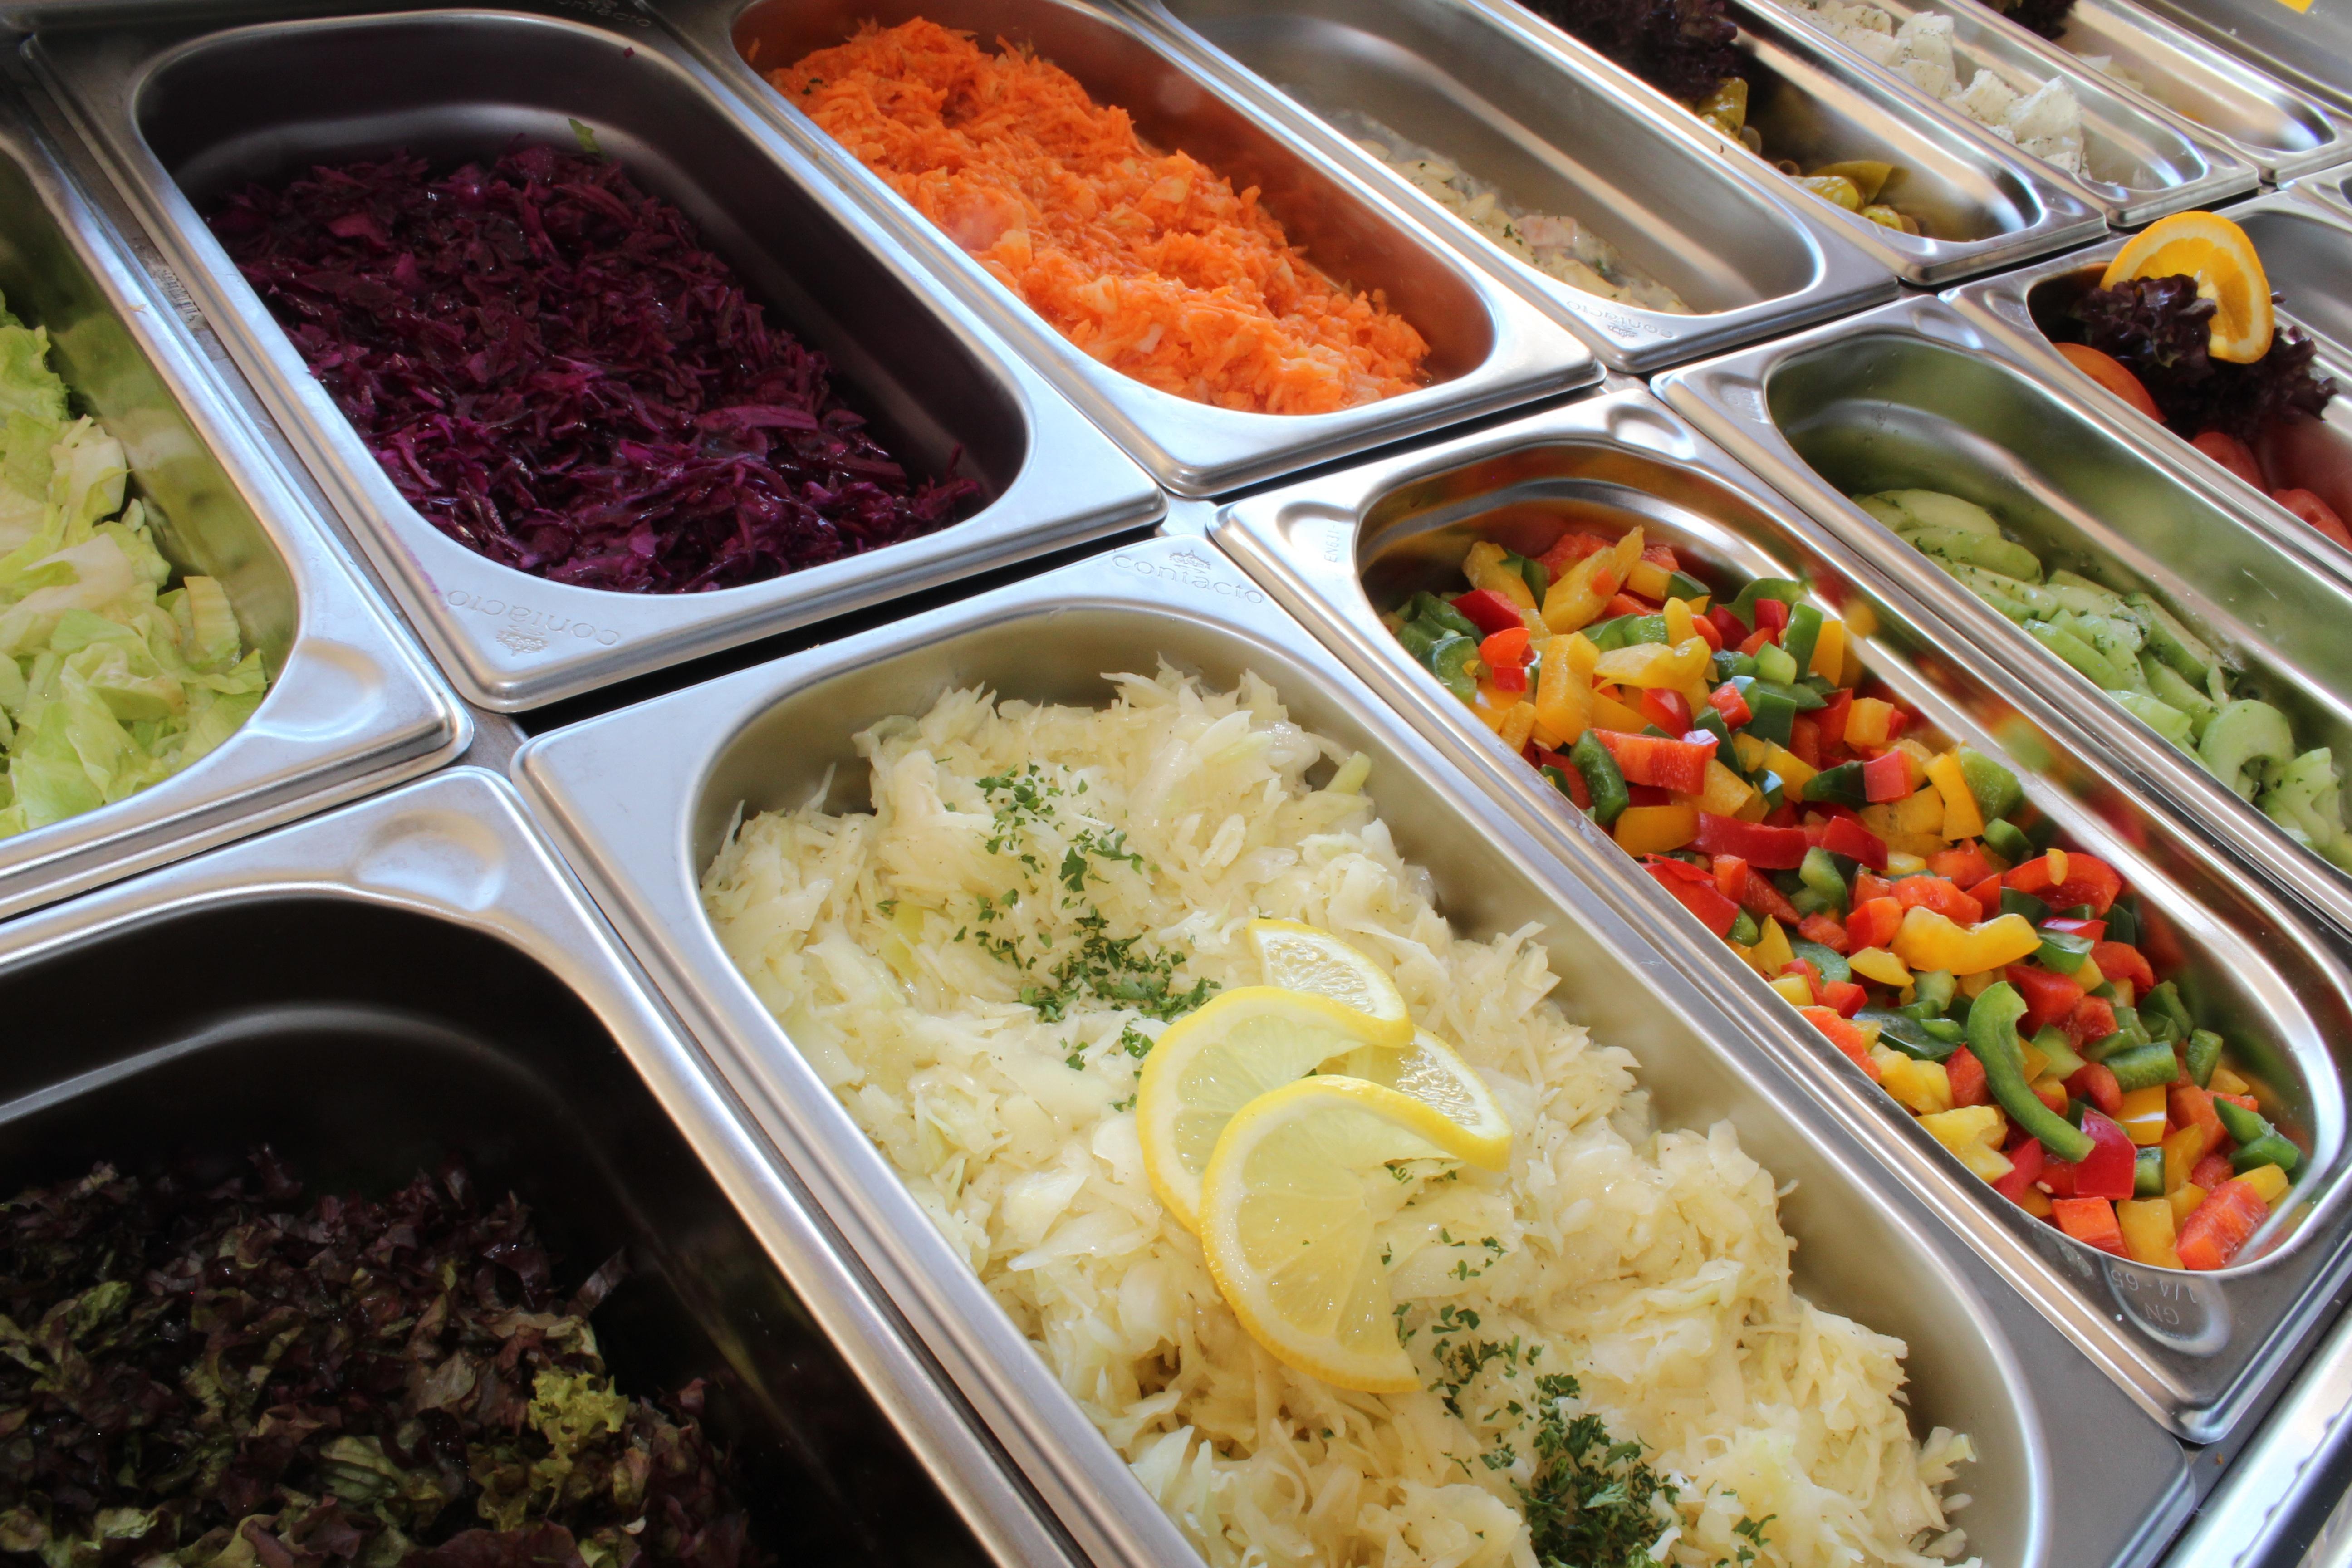 salad-bar-2094459